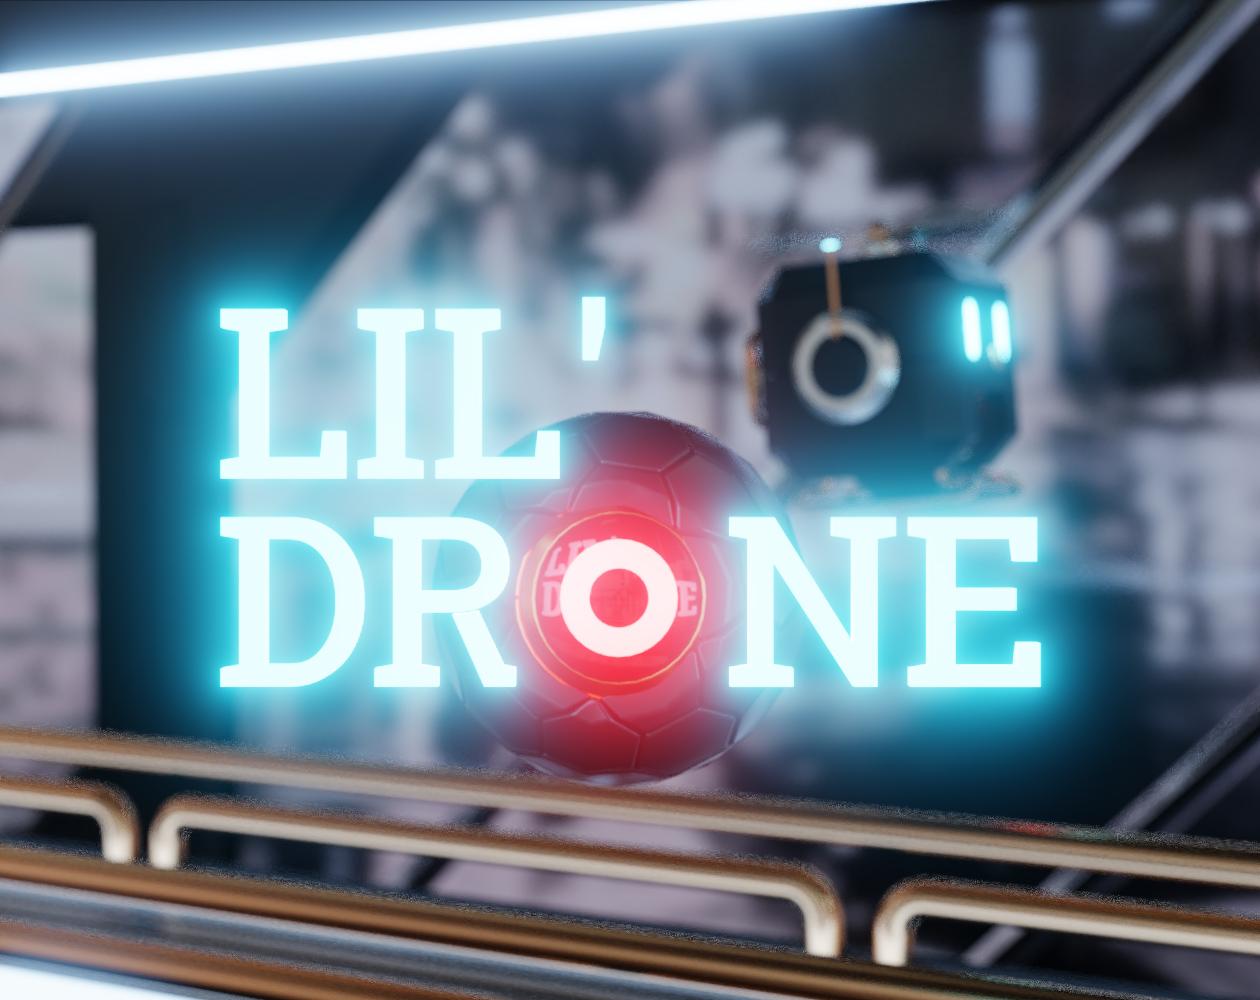 LIL' DRONE